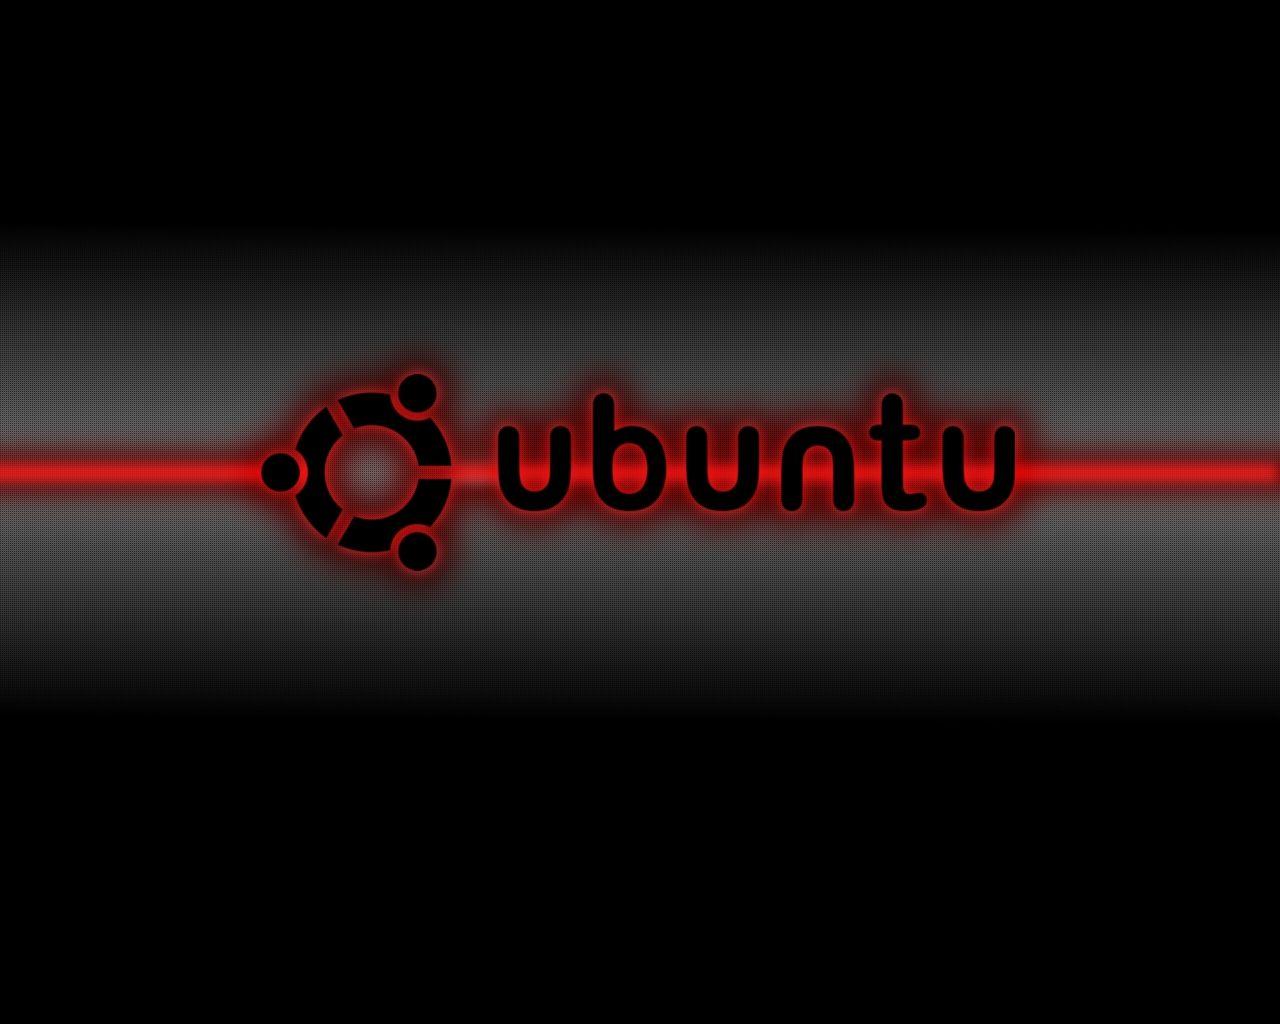 Ubuntu Dark Hd Desktop Wallpaper Instagram Photo Background